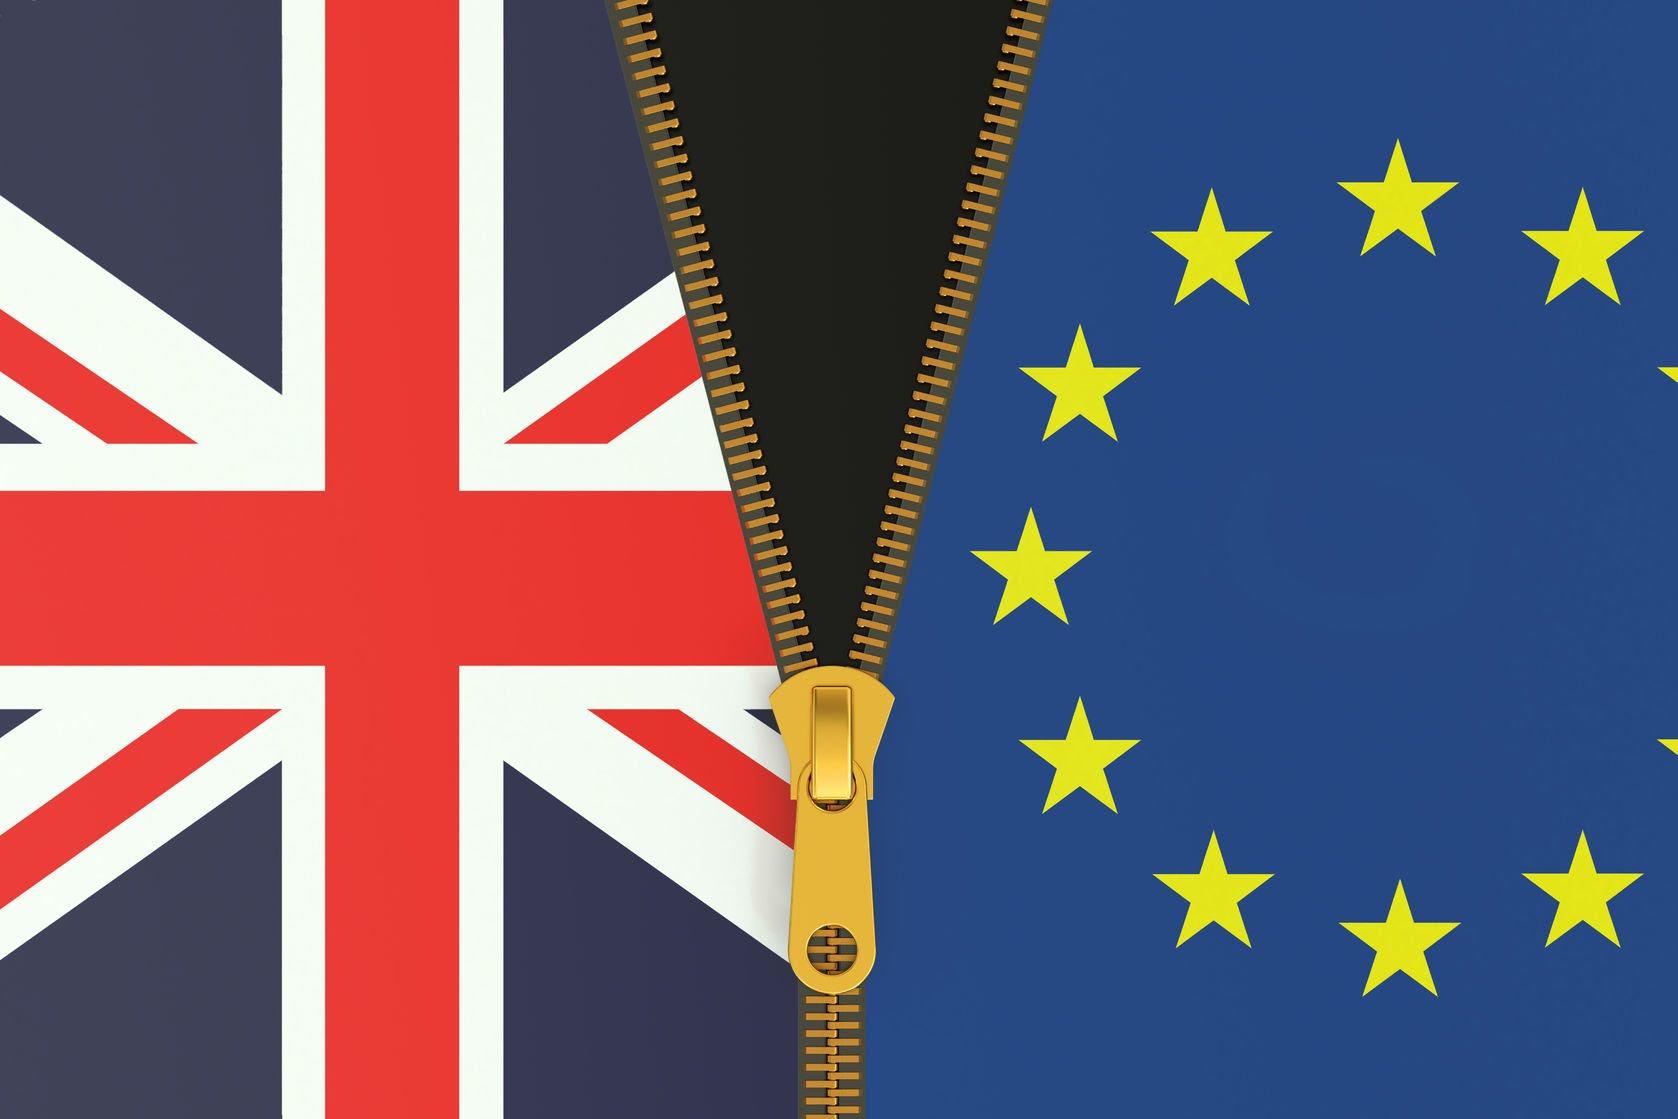 Listen to the Brexit Audio Cheatsheet